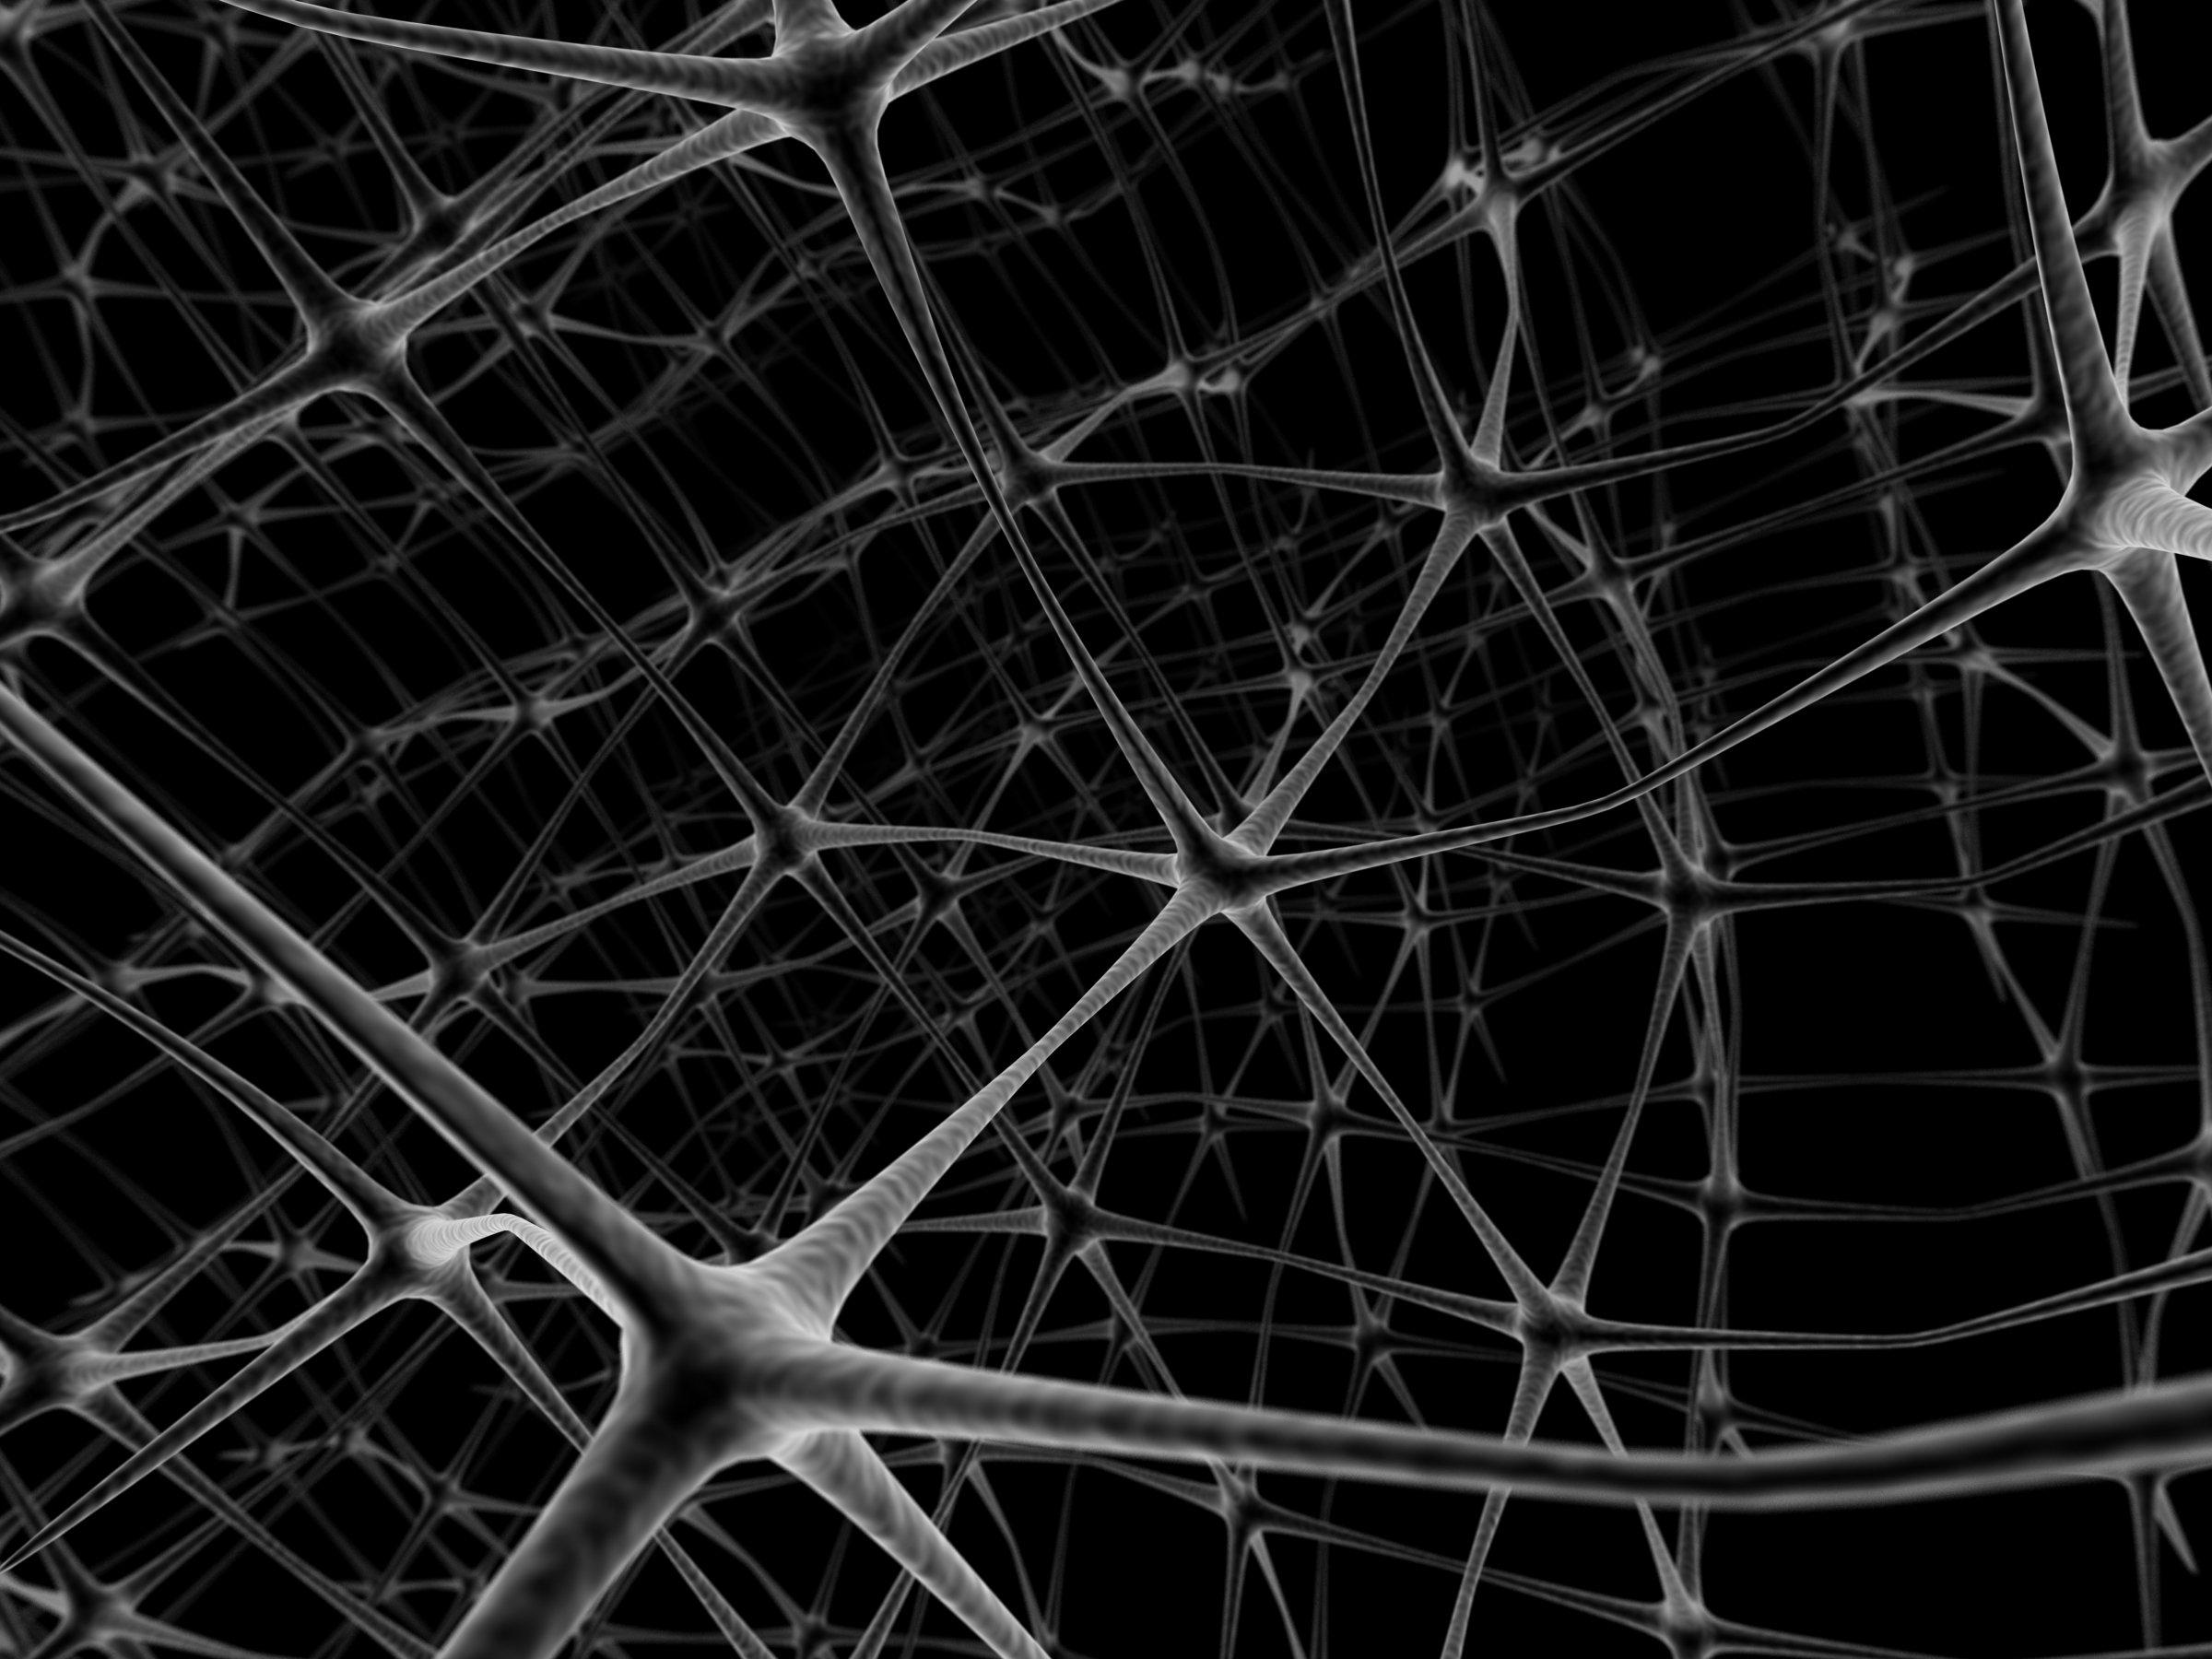 medical wallpaper black: Brain Anatomy Medical Head Skull Digital 3-d Psychedelic